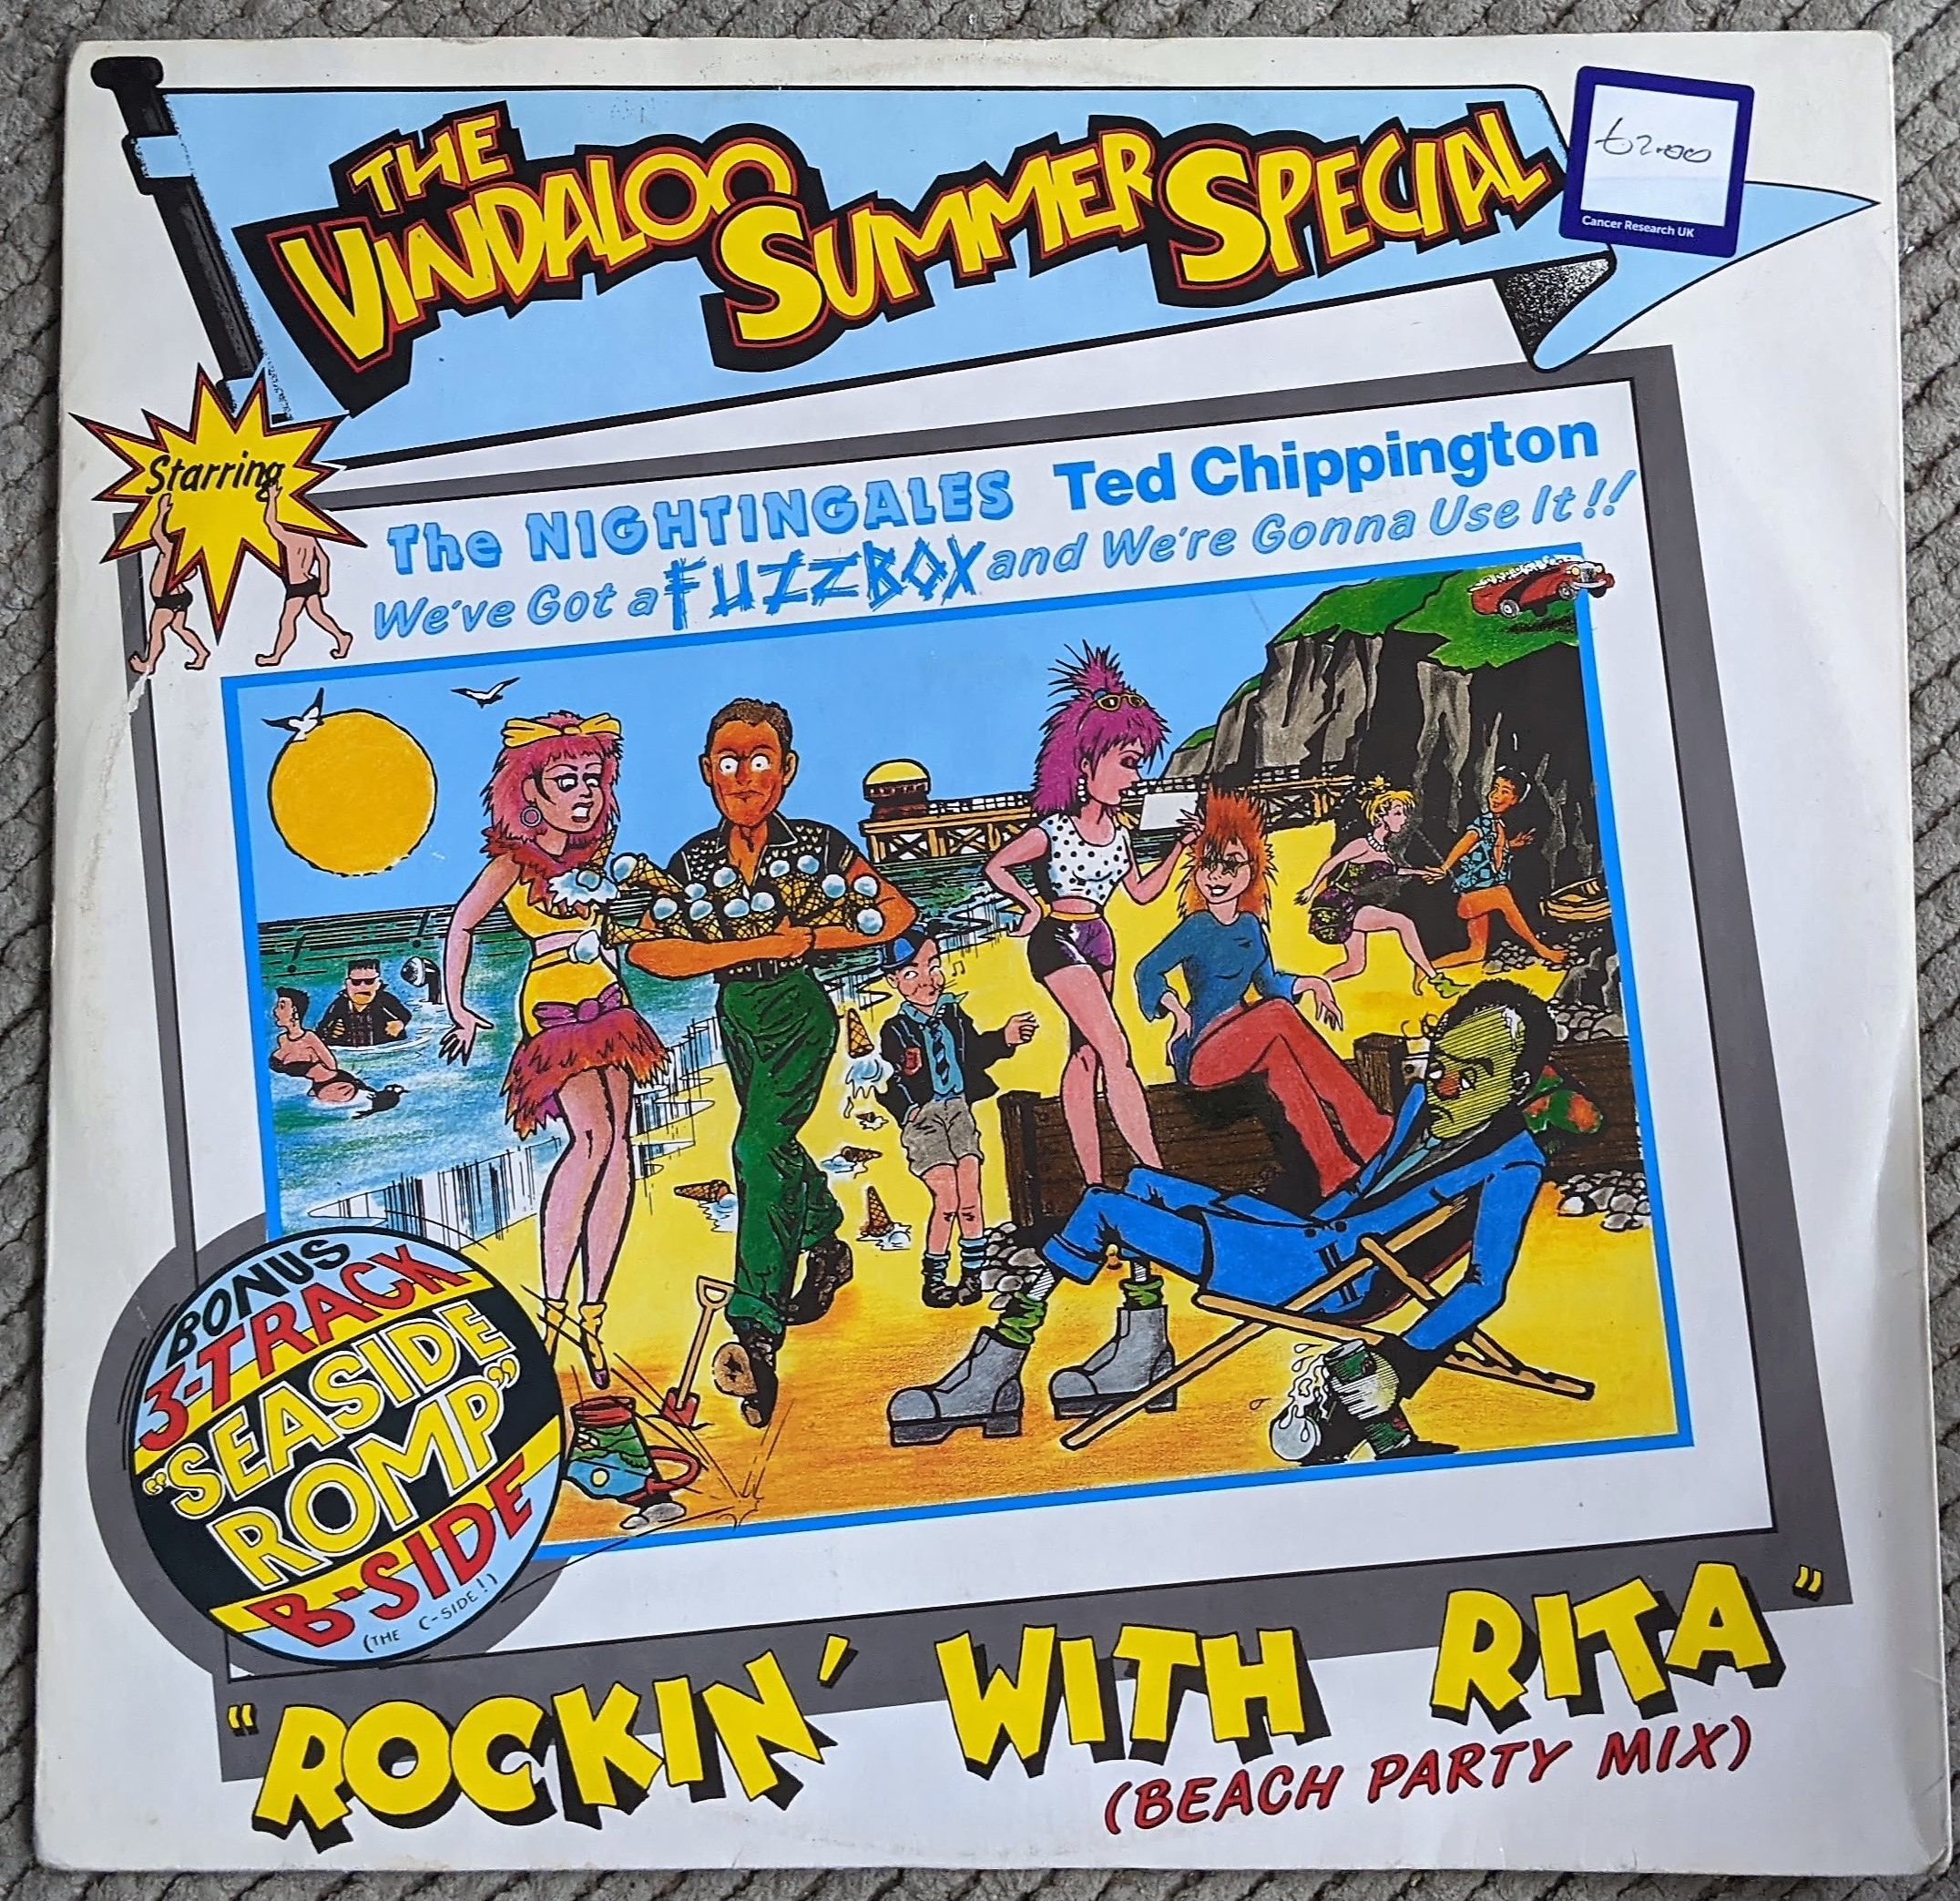 Vindaloo Summer Special Cover